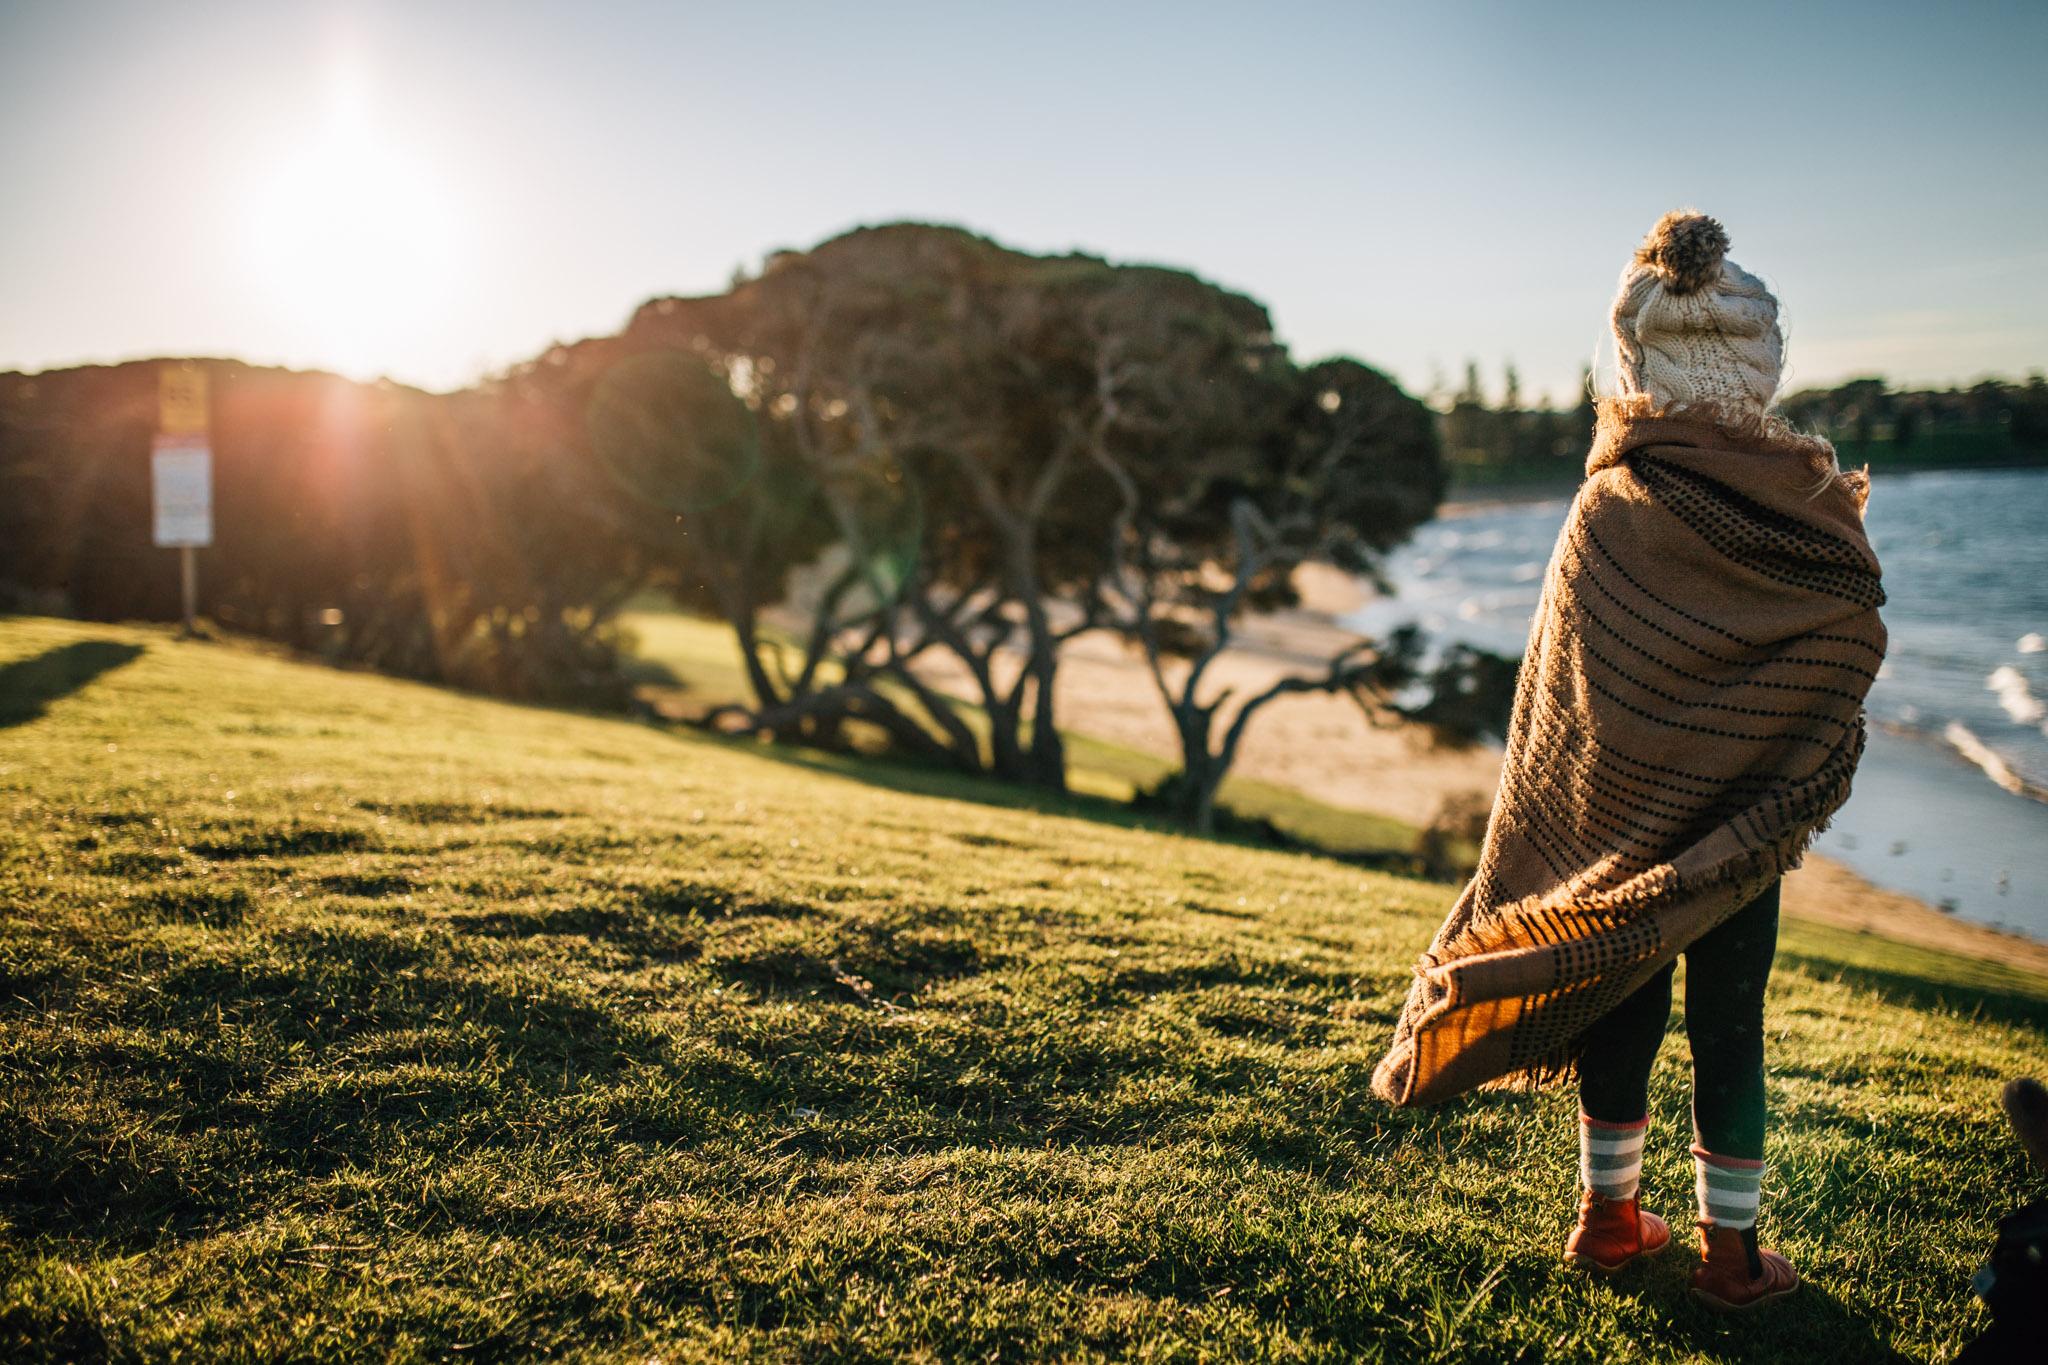 cold girl in blanket looking out over ocean (1 of 1).jpg